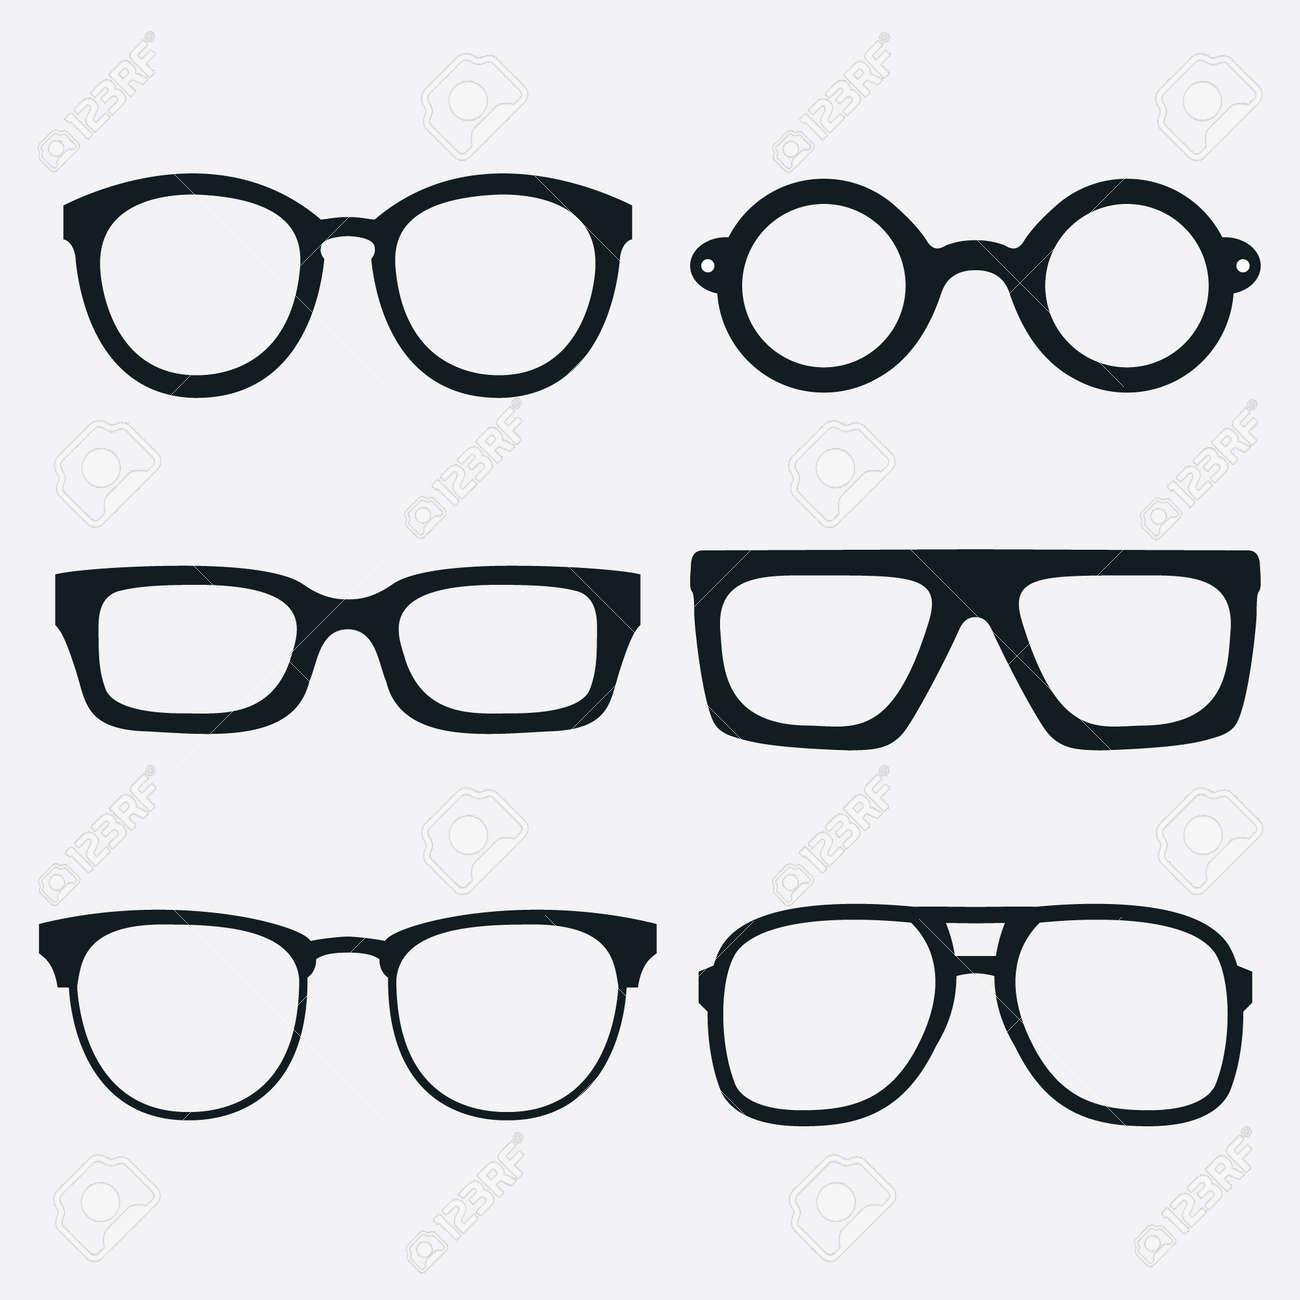 5b11899b53 Set of glasses frames royalty free cliparts vectors and stock jpg 1300x1300 Glasses  frames vector